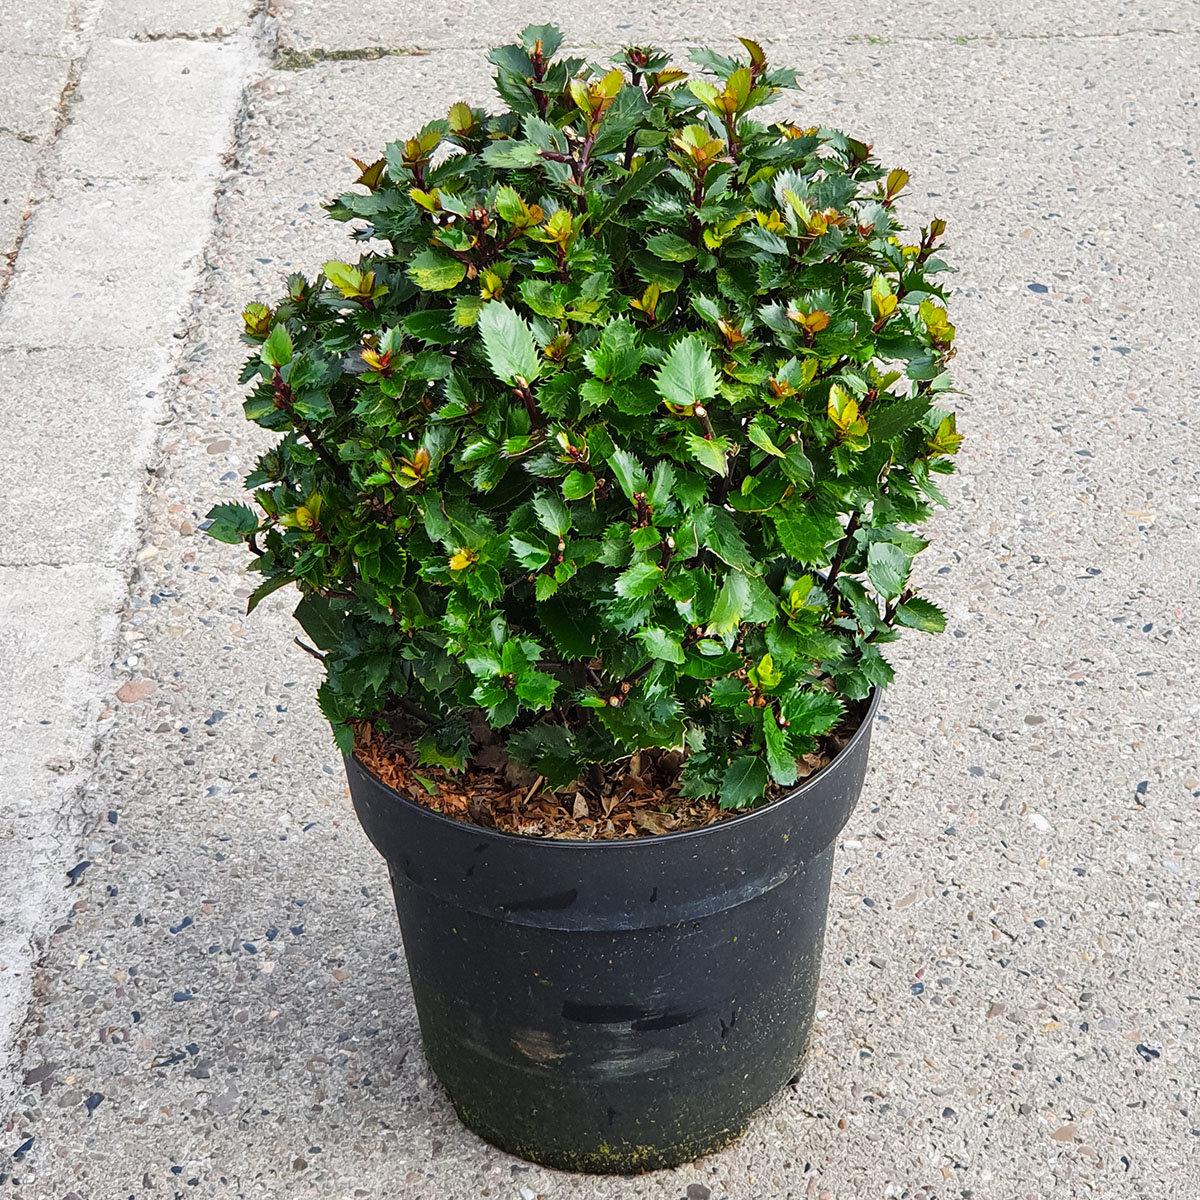 Stechpalme, dunkelgrün, im ca. 21 cm-Topf | #3